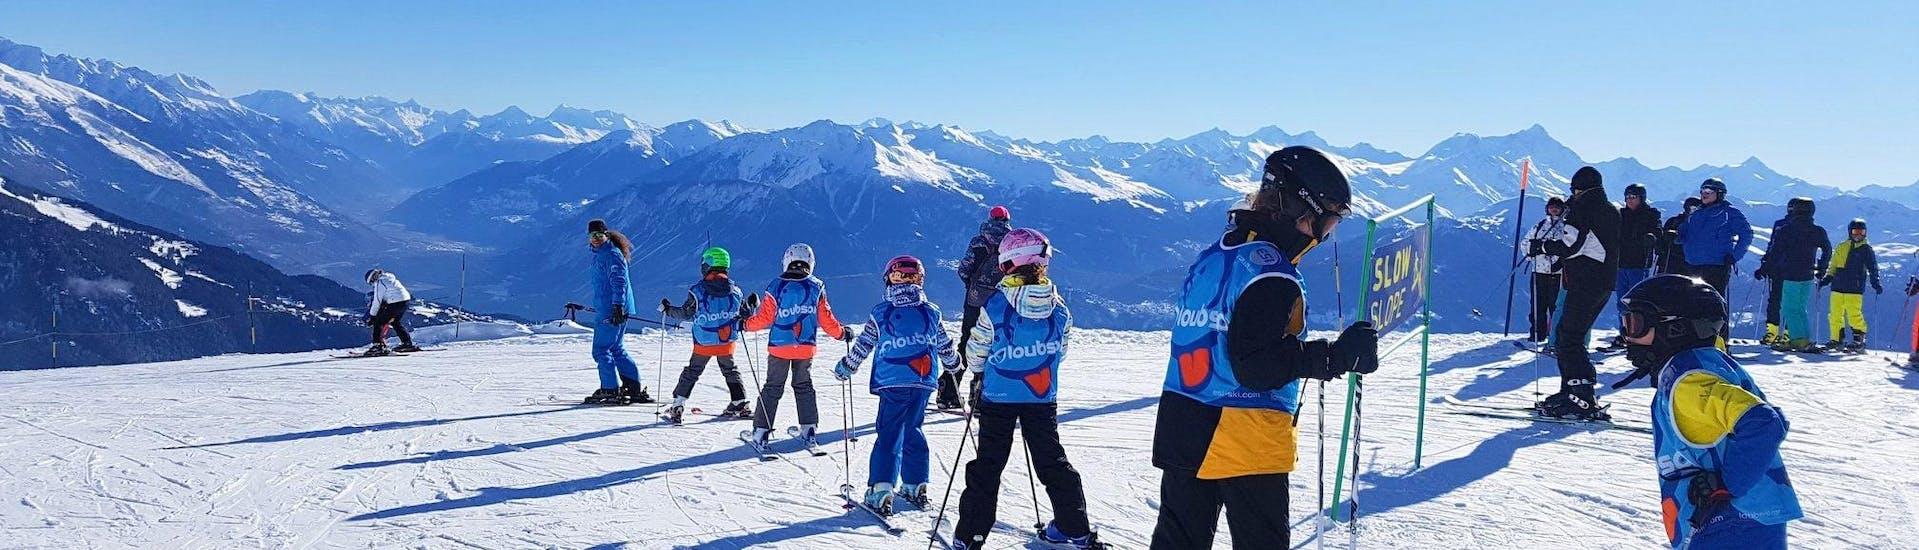 kids-ski-lessons-esi-glycerine-anzere-hero